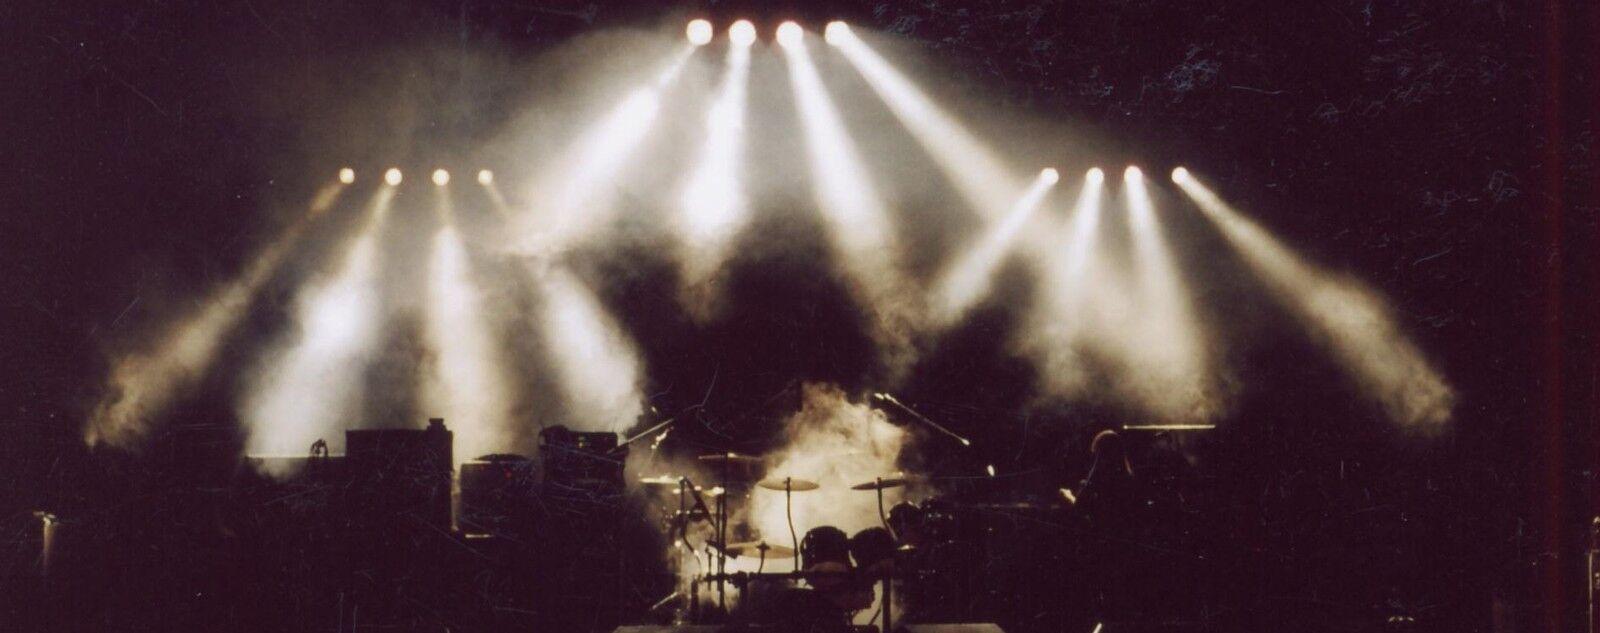 Nightowl Stage Lighting Pro Shop